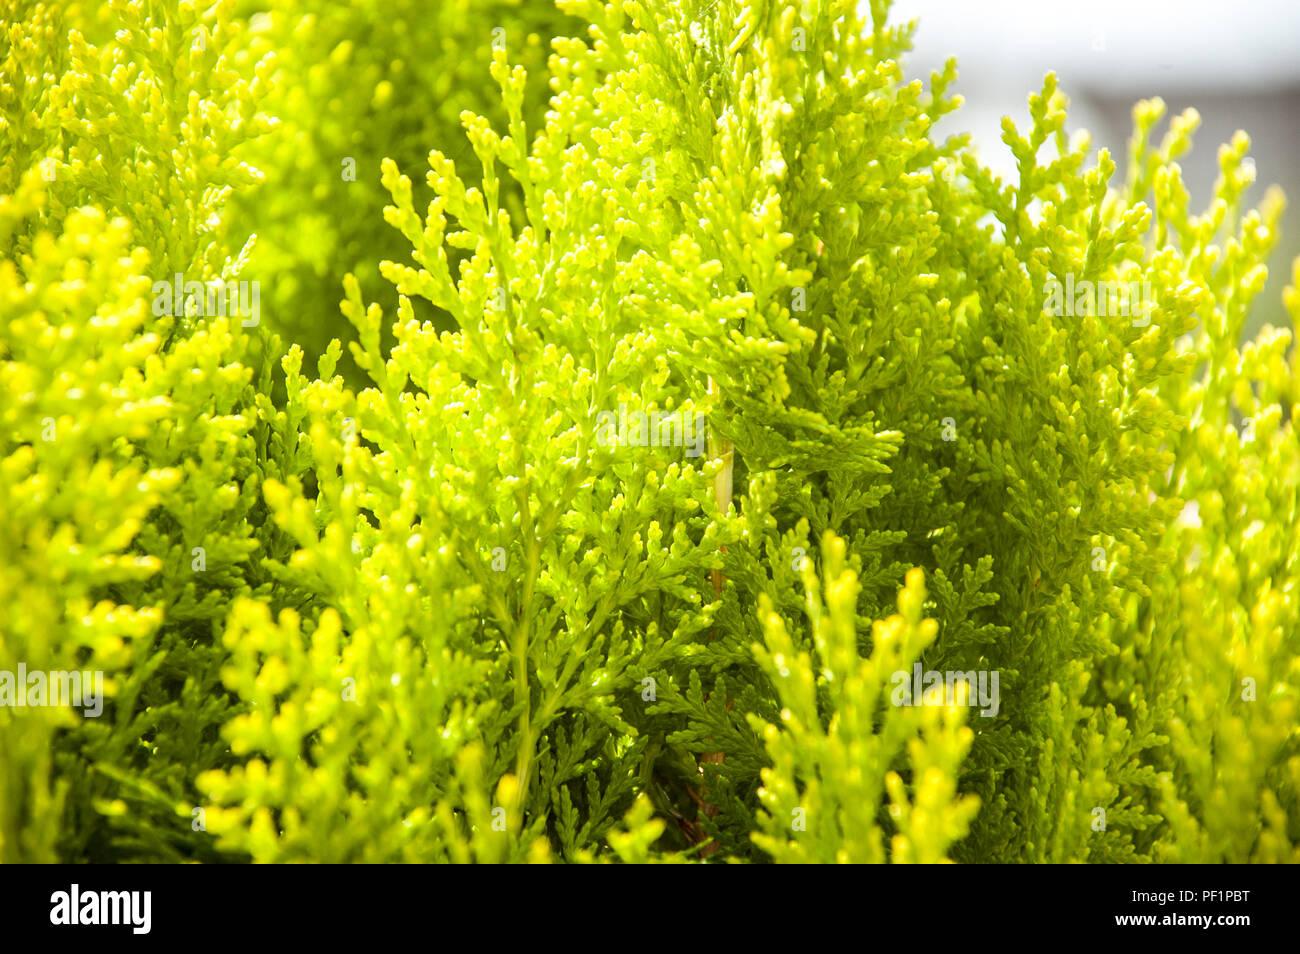 thuya evergreen garden bush - Stock Image